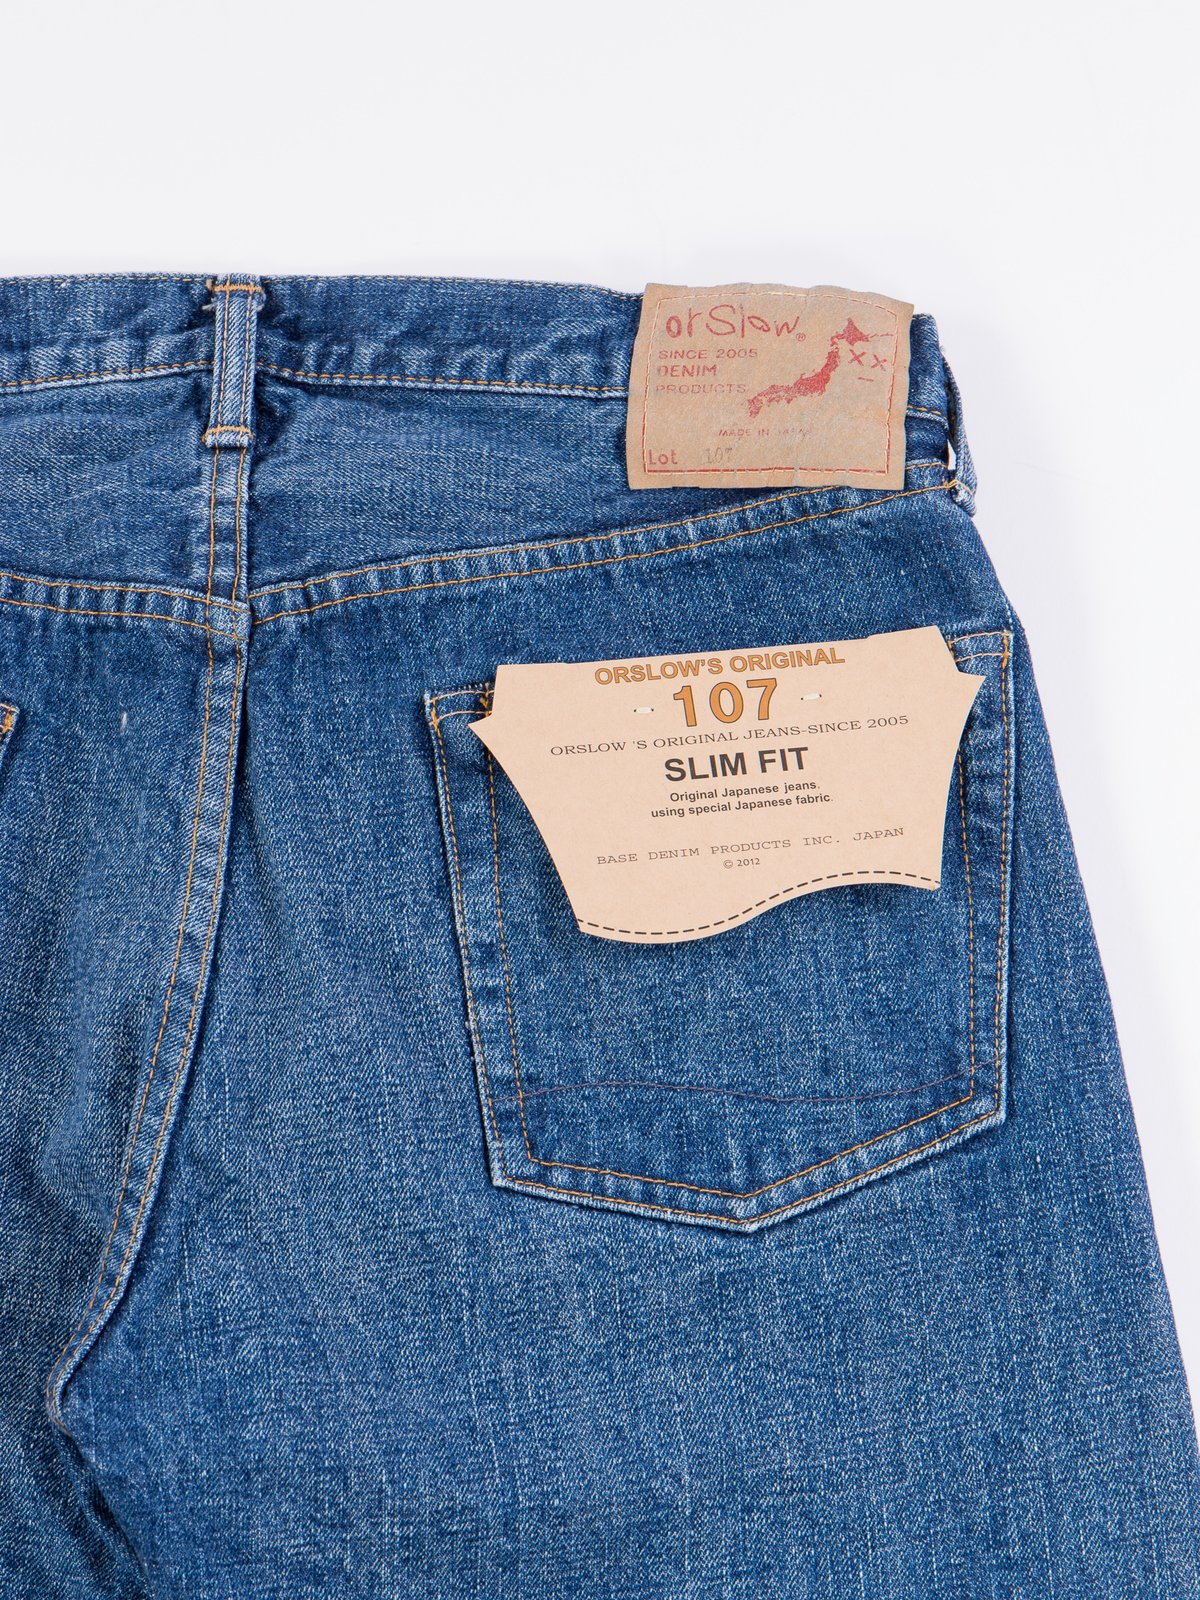 2 Year Wash 107 Slim Fit Jean - Image 7